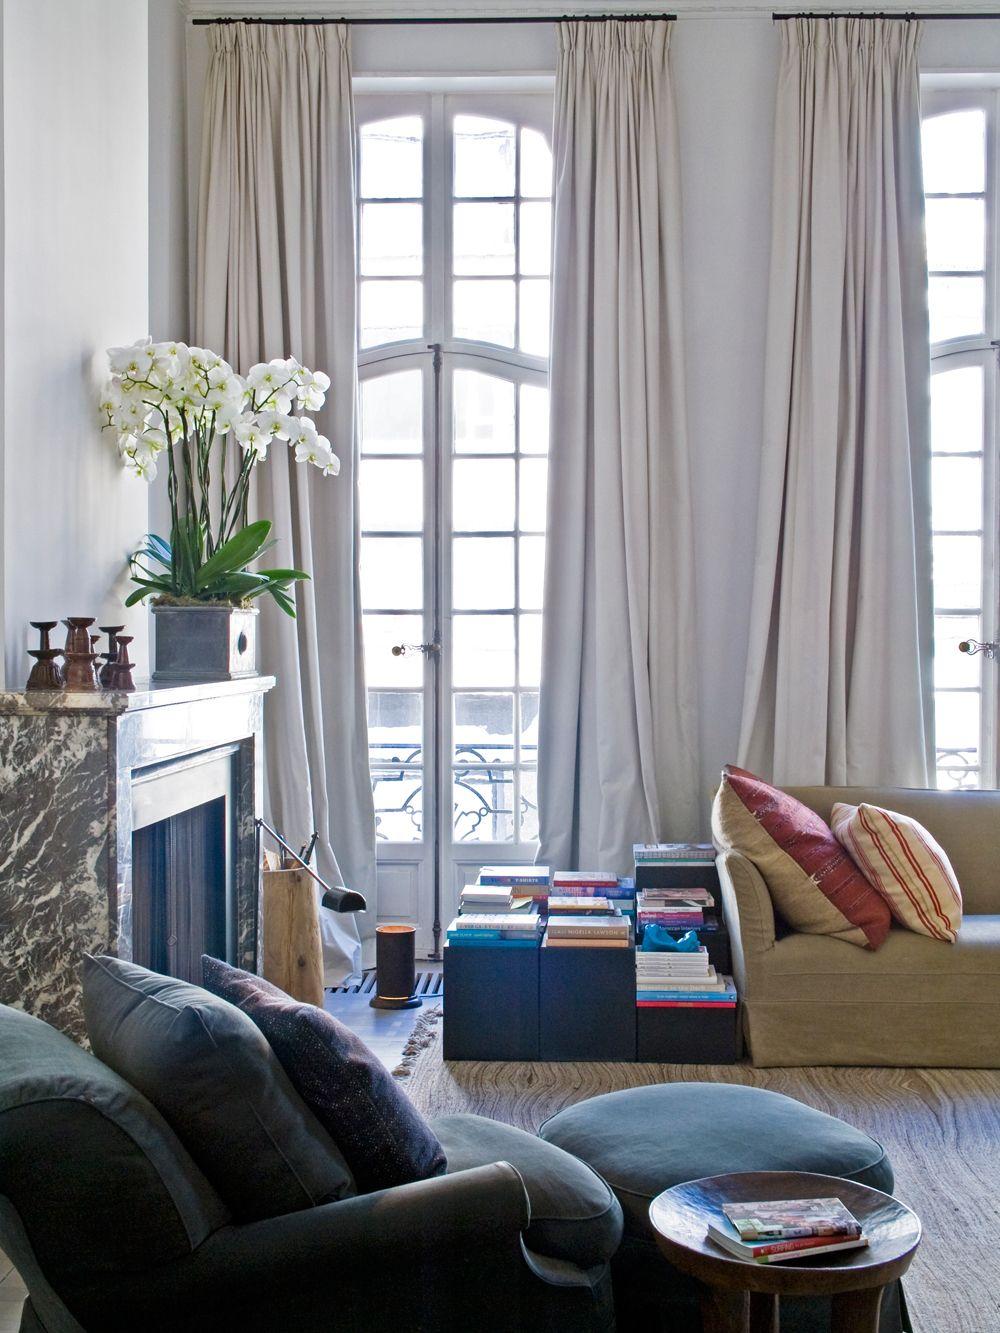 Wohntraum in Antwerpen | Shelves, Interiors and Walls